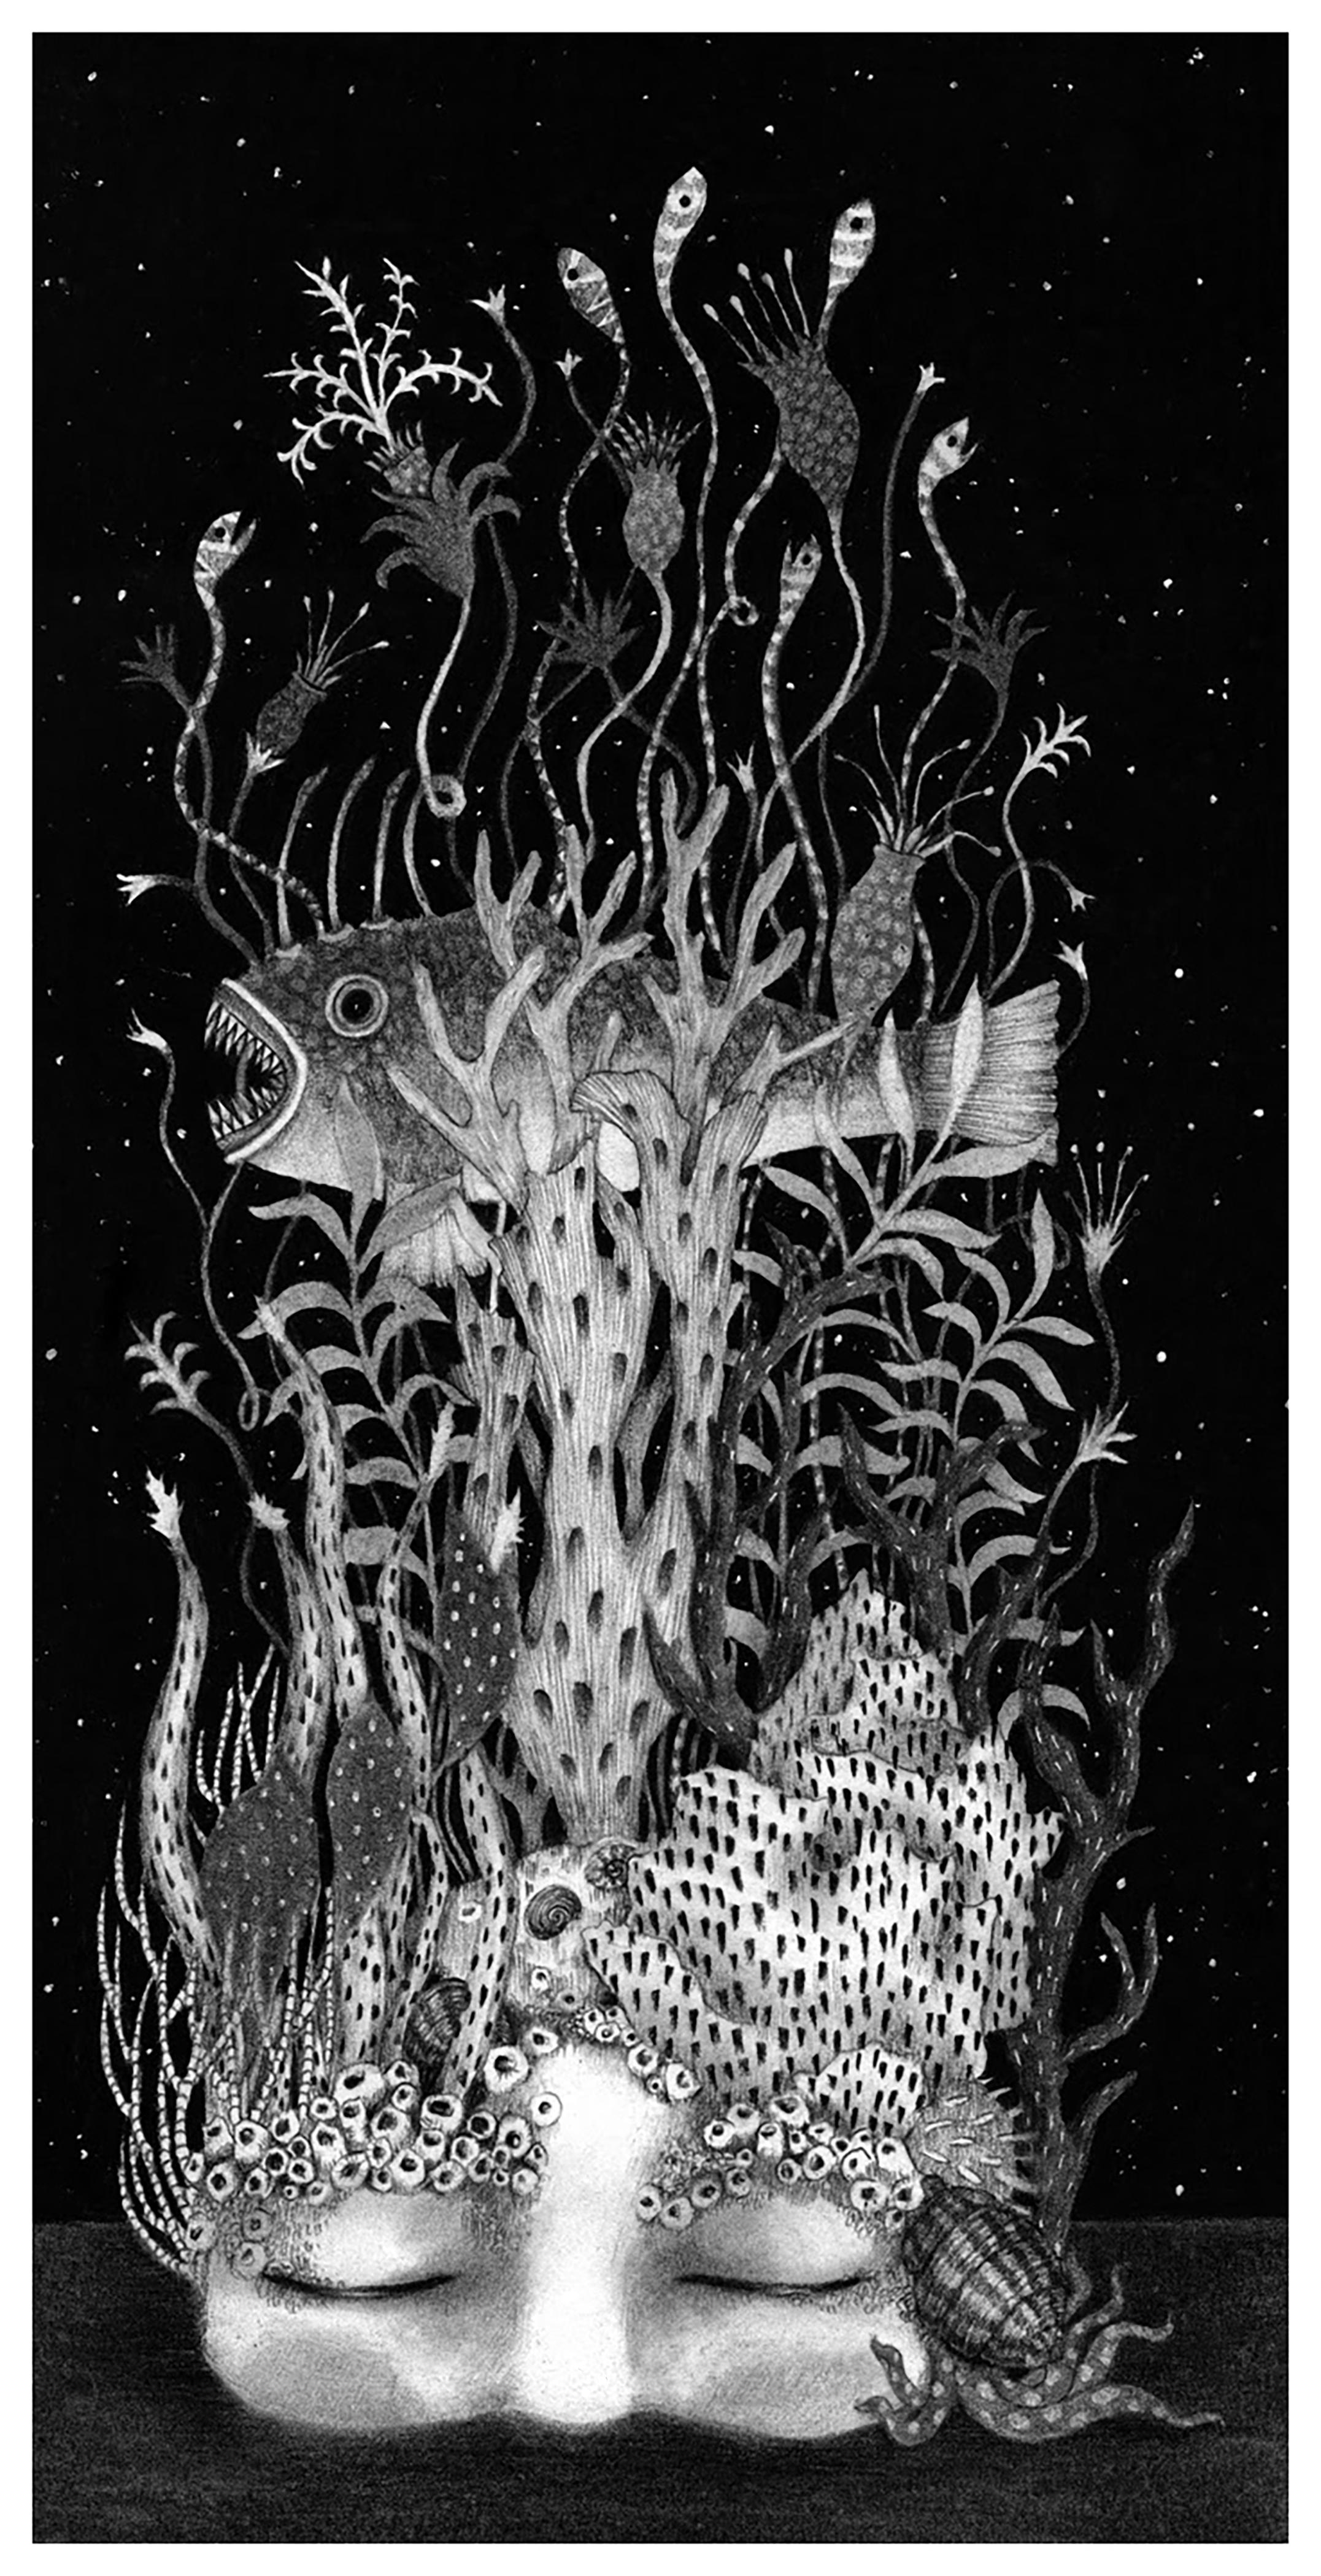 seahead_7x14_Print.jpg